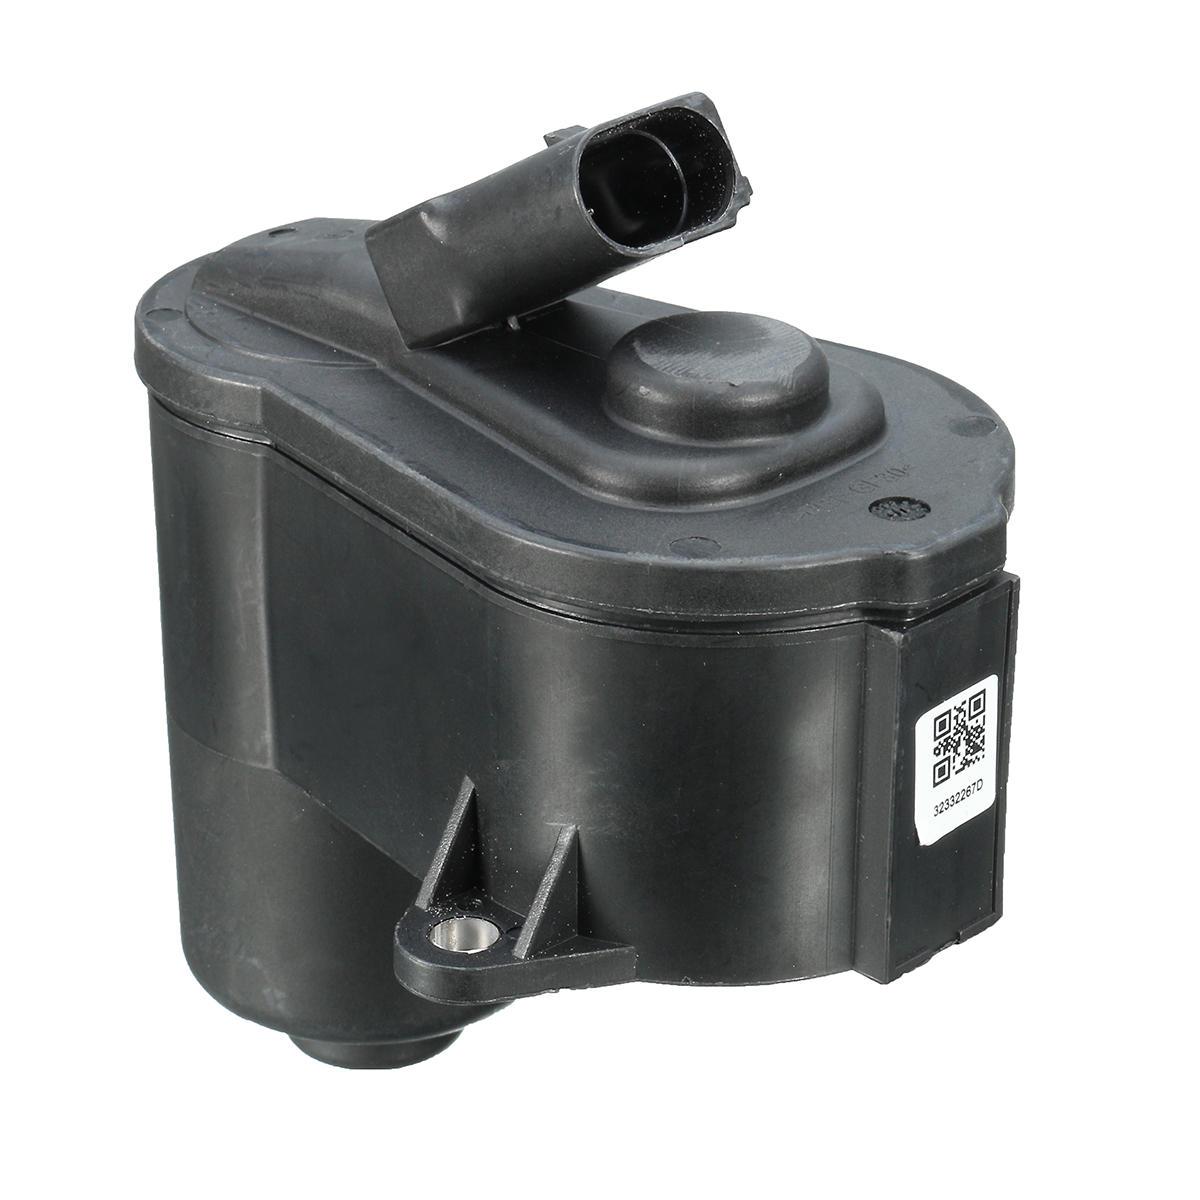 Calibrador de freno electrónico de 6 dientes Servo motor para Audi Q3 3C0 998 281 A